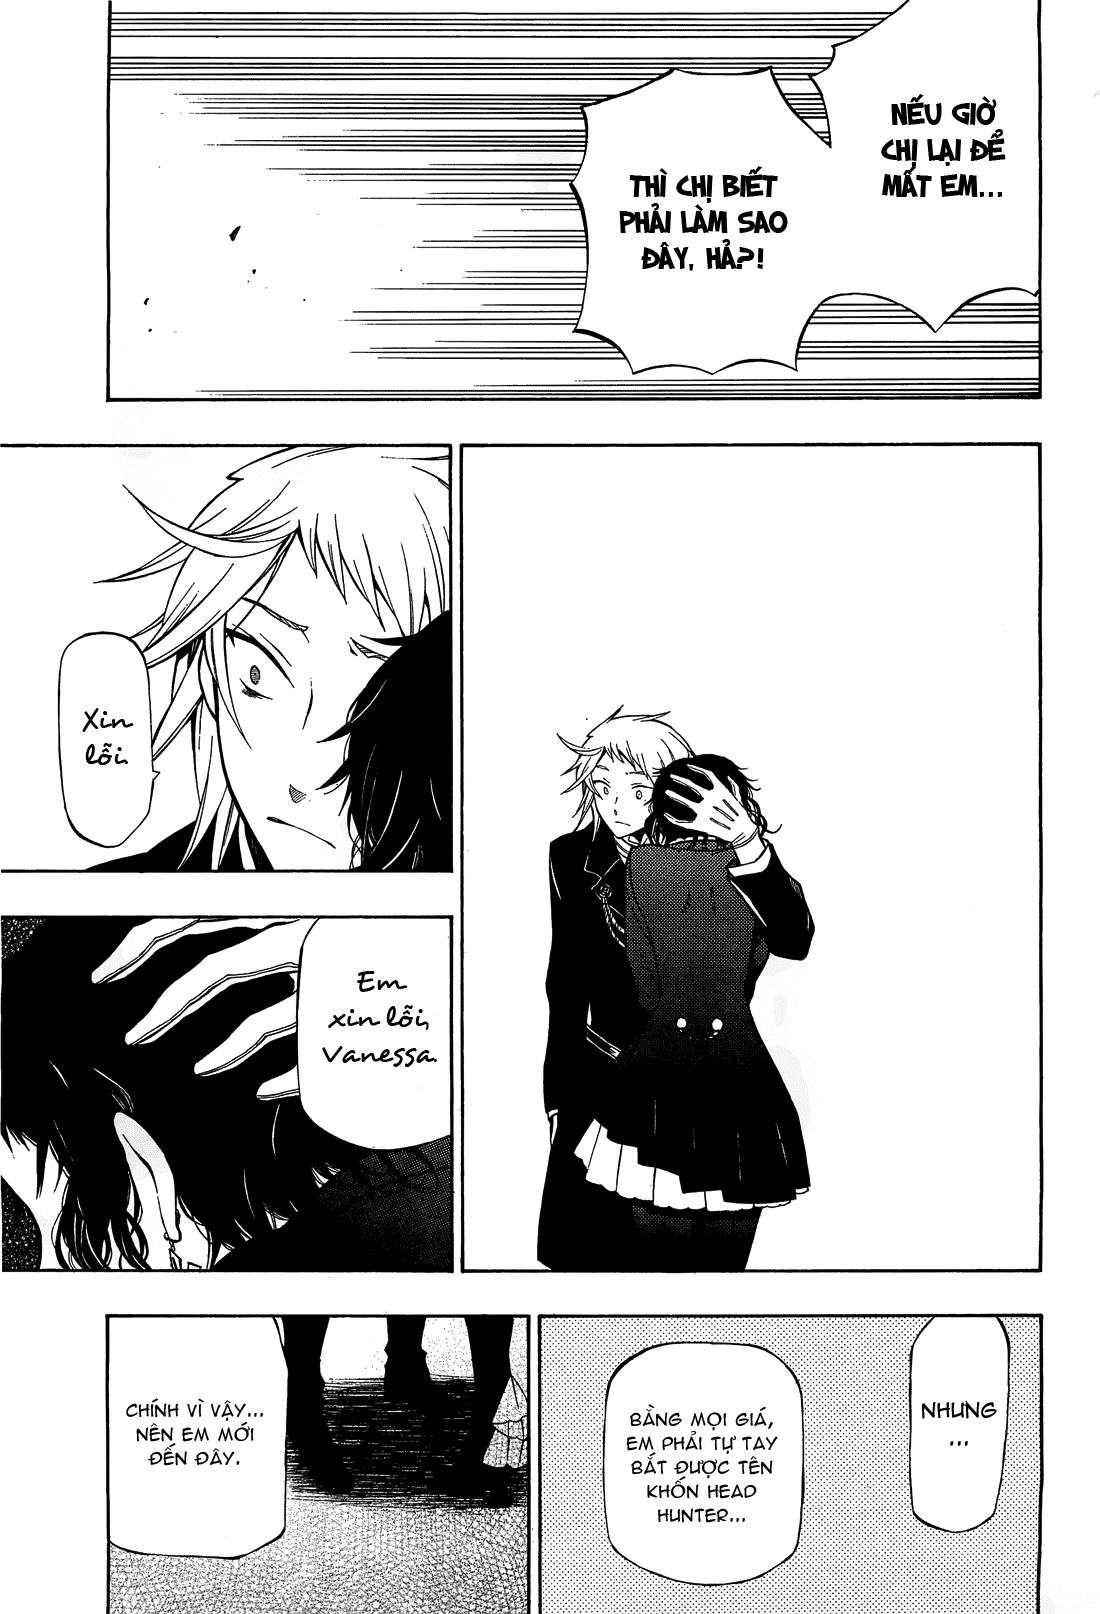 Pandora Hearts chương 052 - retrace: lii bloody rites trang 38